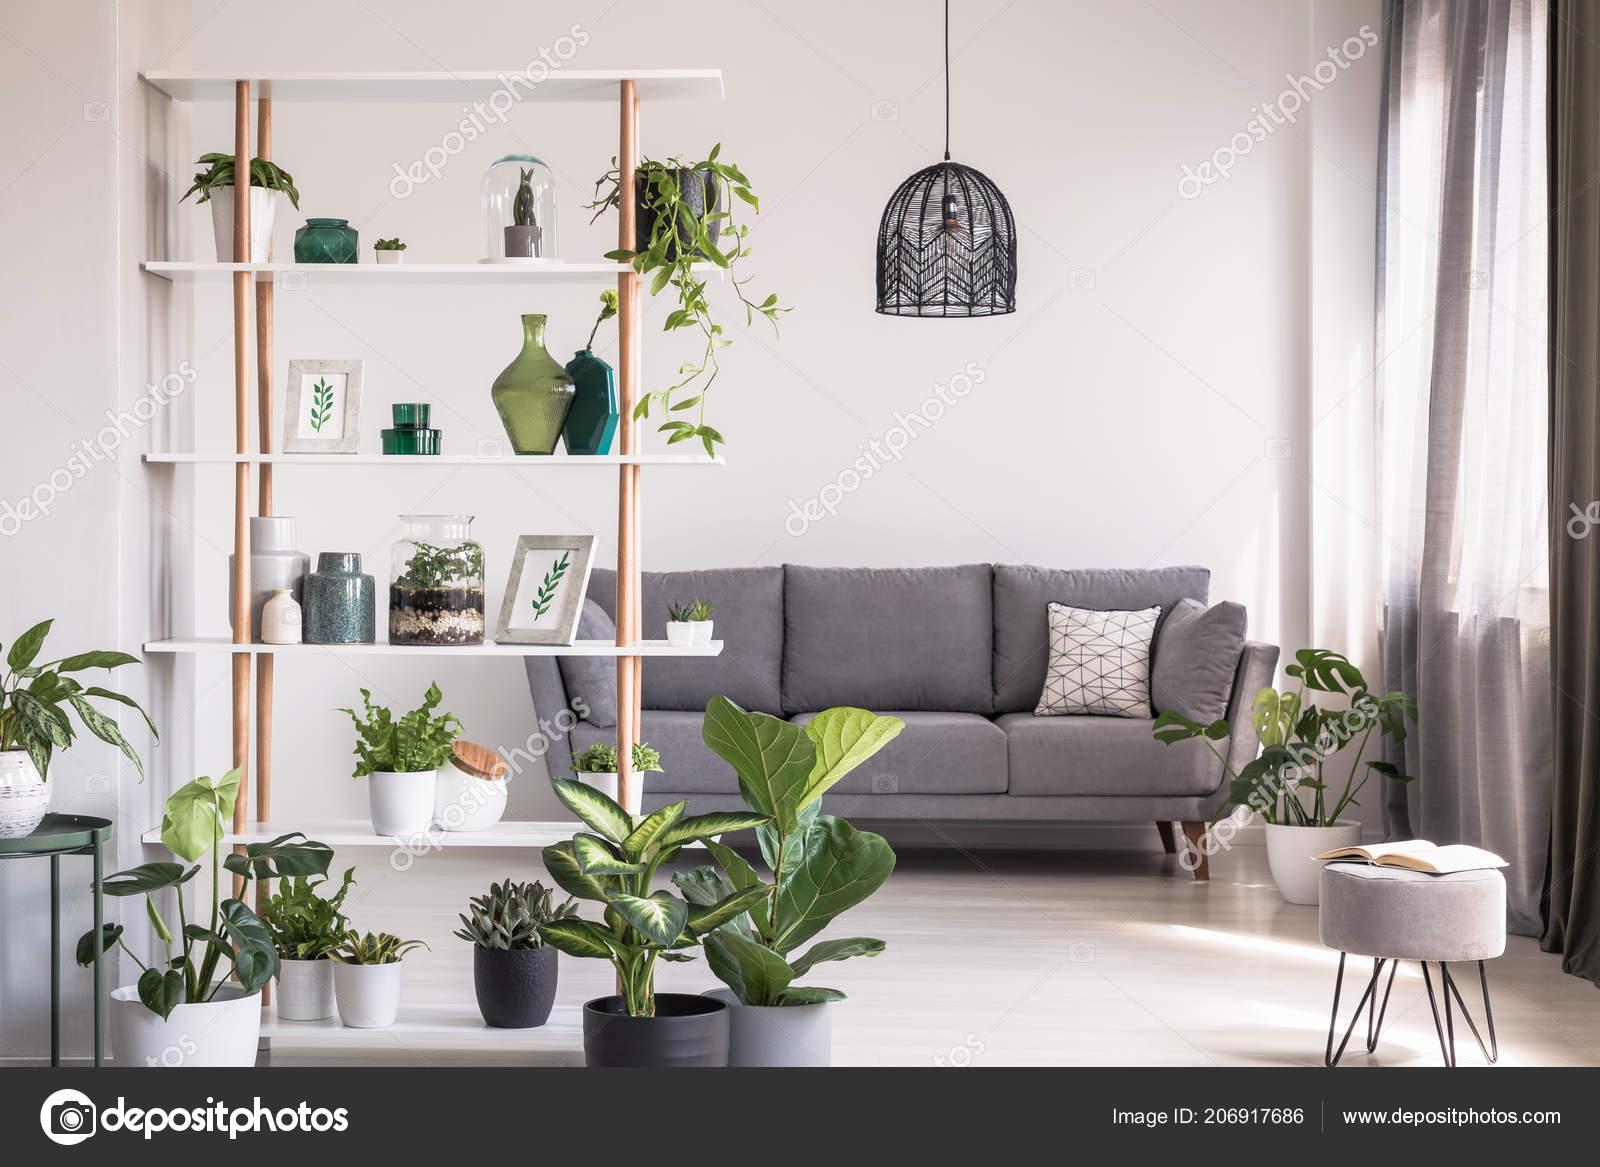 Real Photo Modern Living Room Interior Shelf Decorations